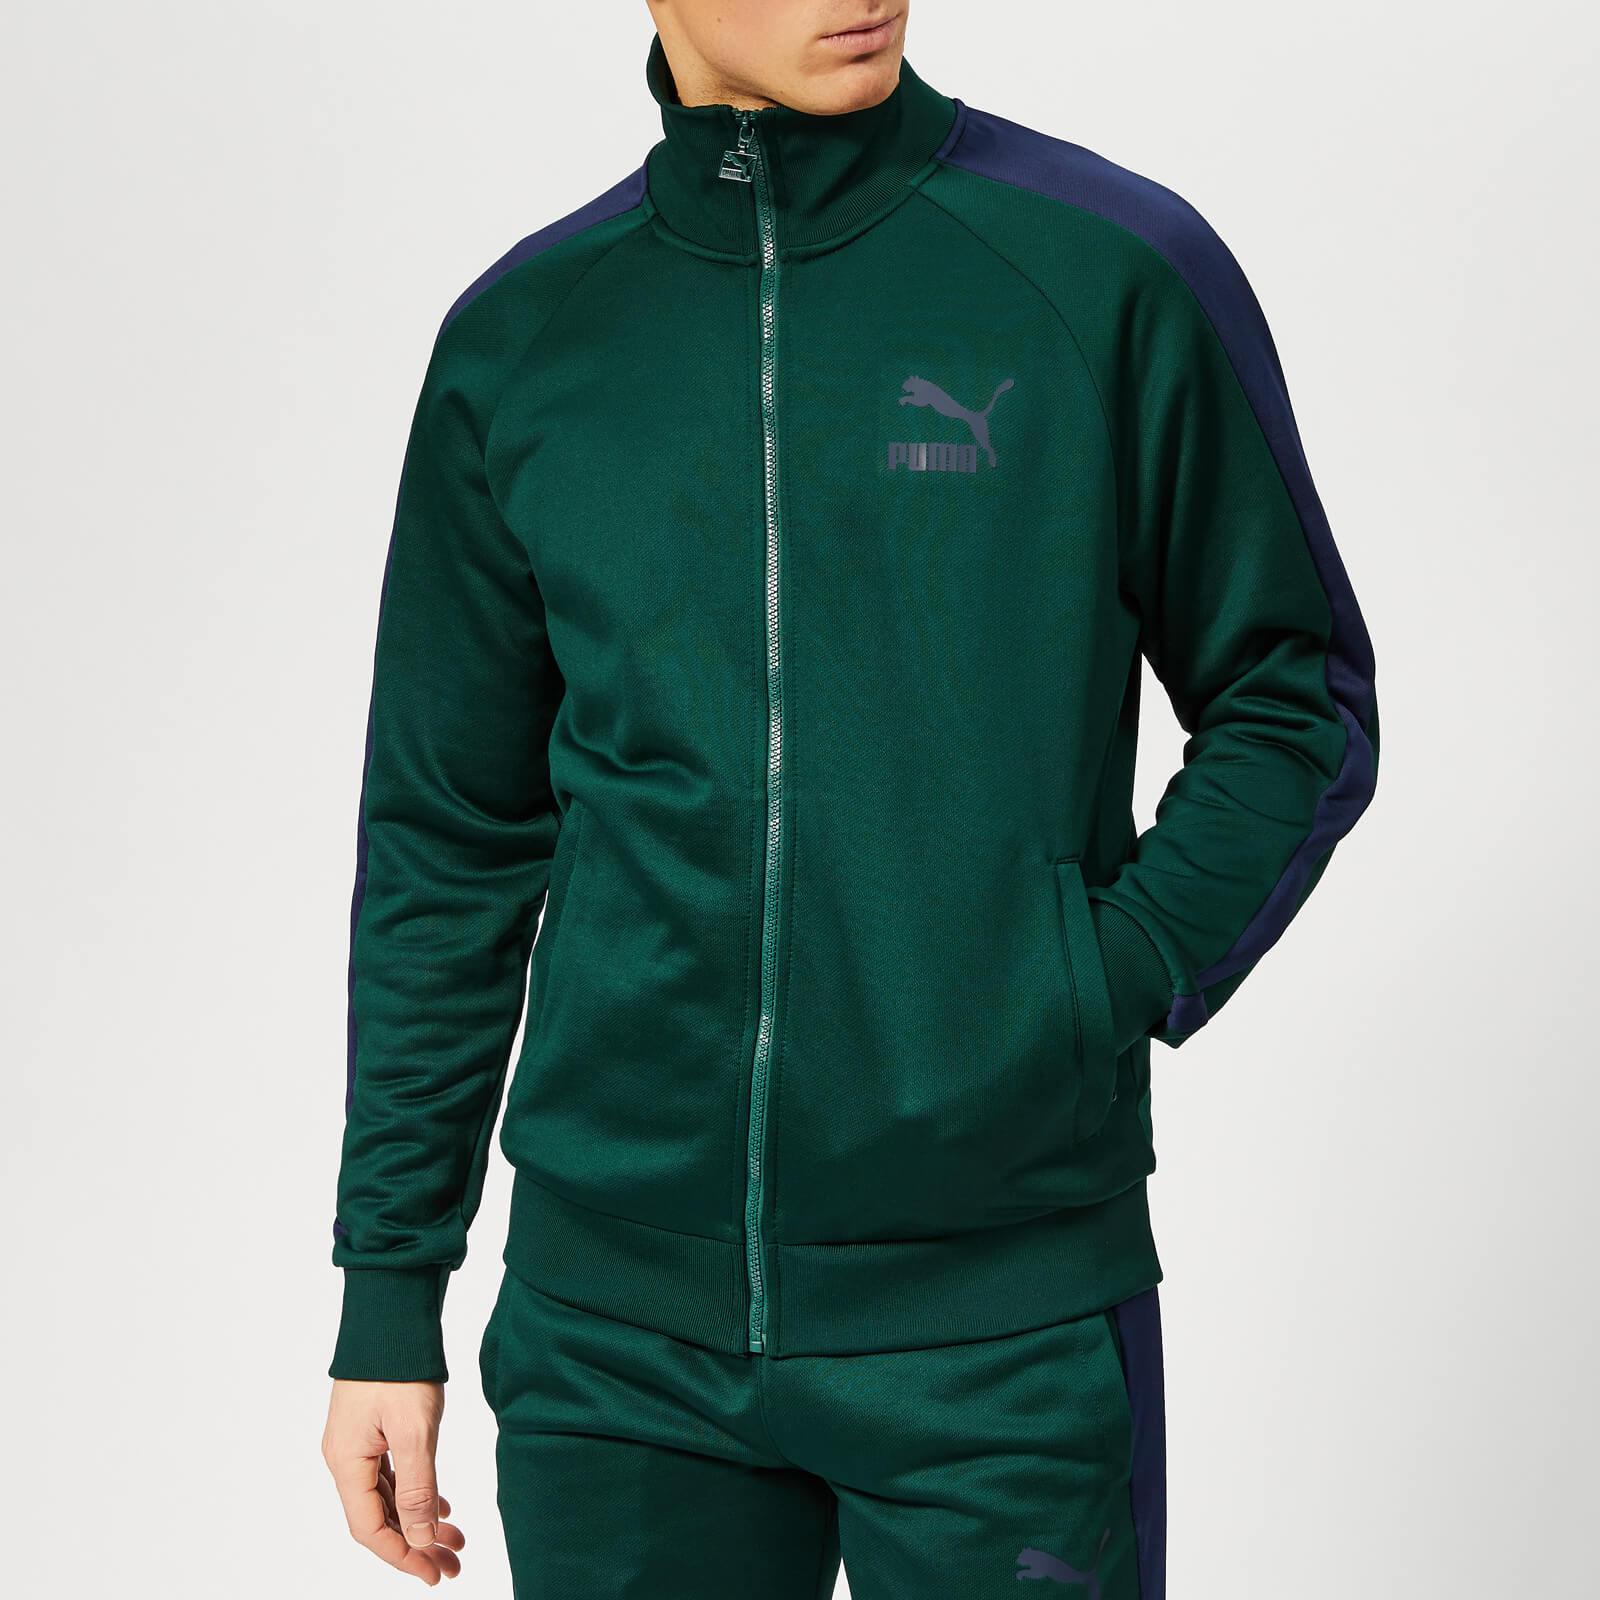 23c9b5e3194b0 Puma Men's Iconic T7 Track Jacket - Ponderosa Pine